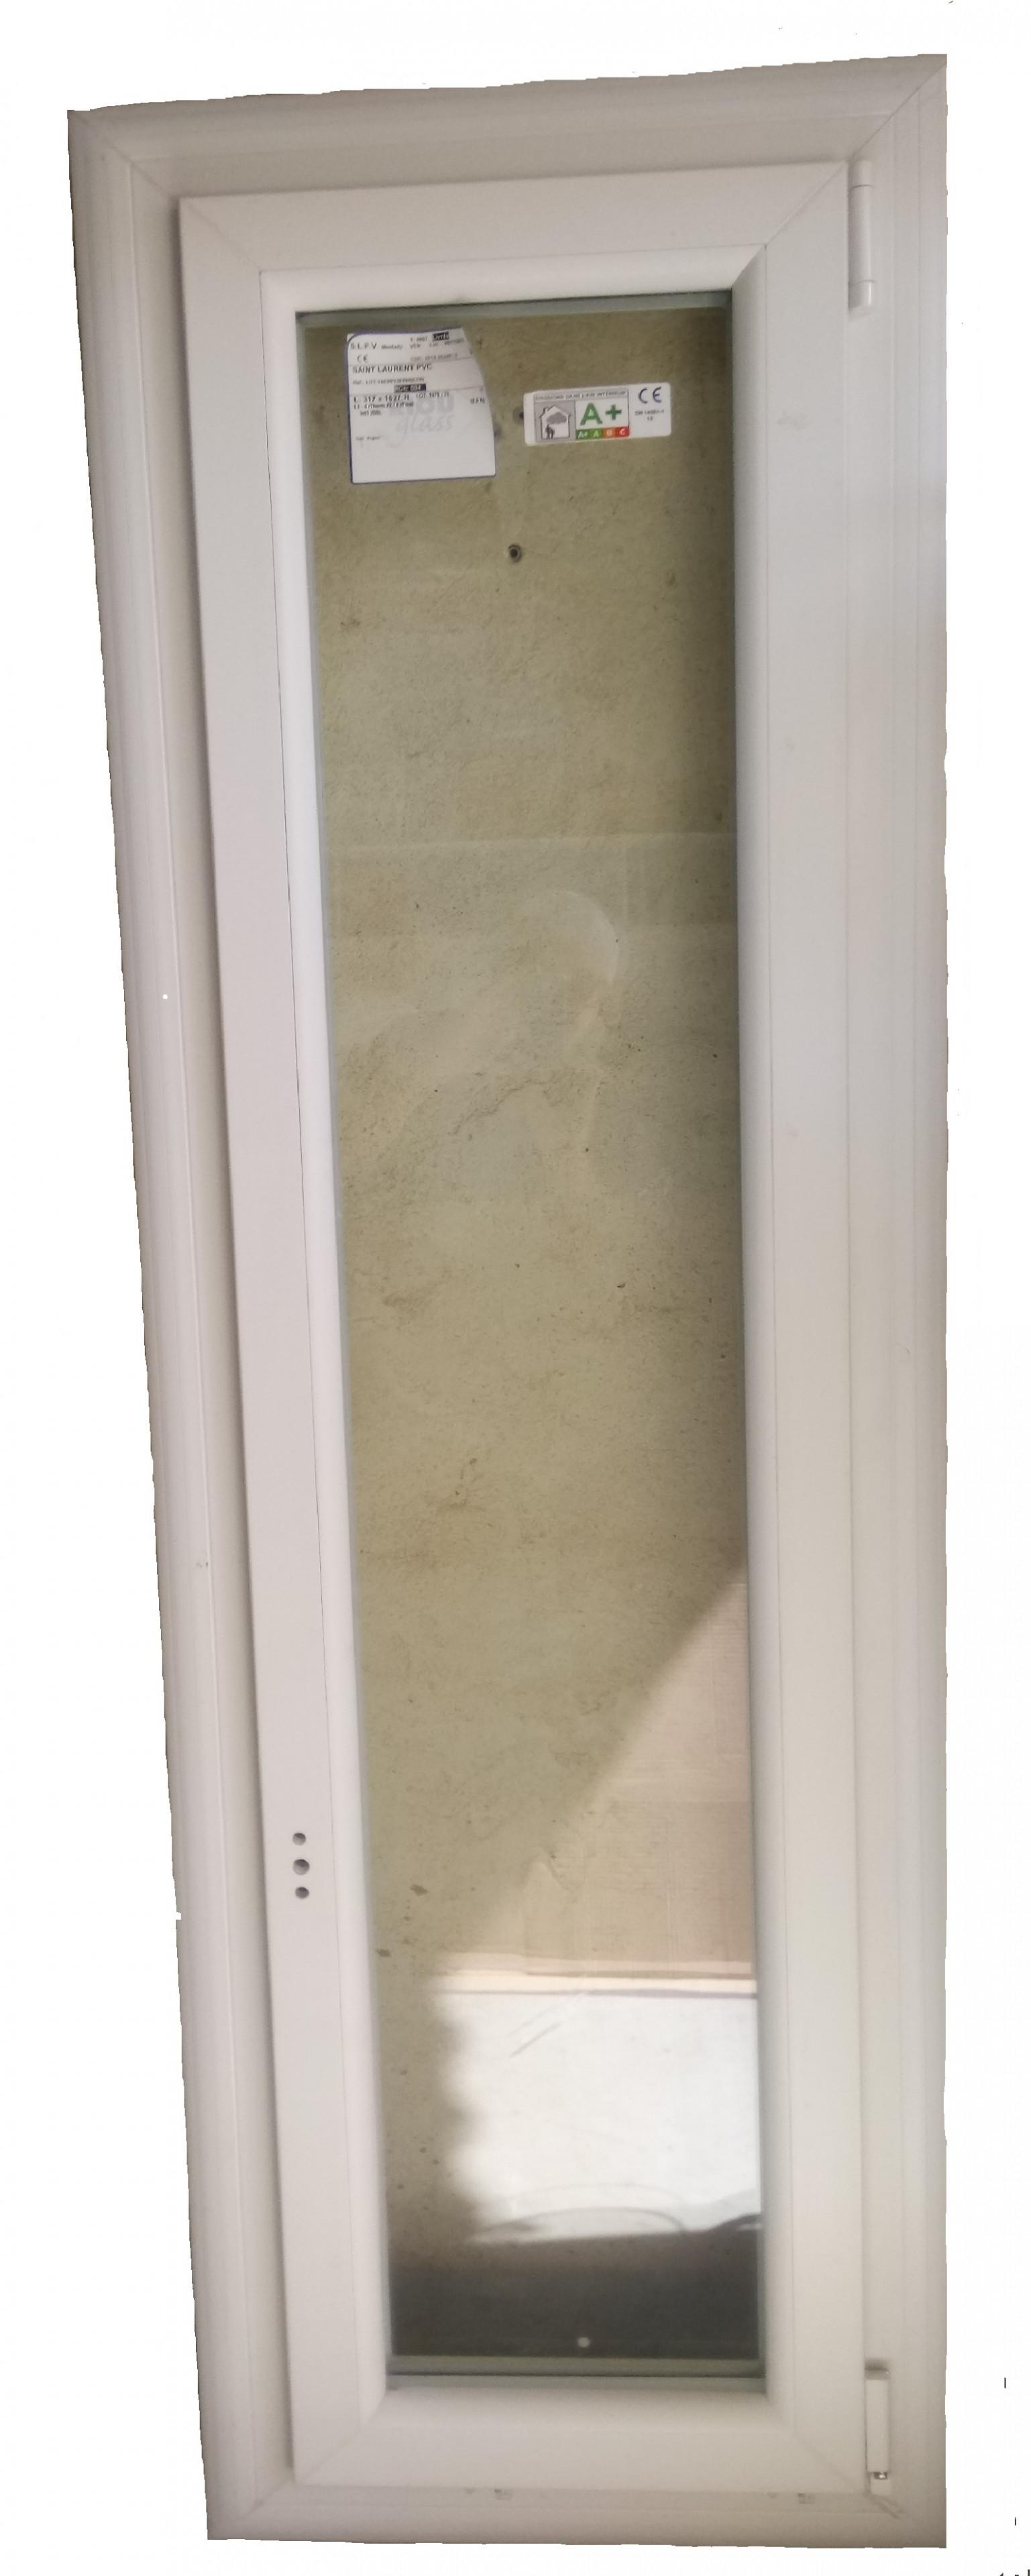 Fenêtre Pvc 1 Vantail Oscillo Battant Bezin